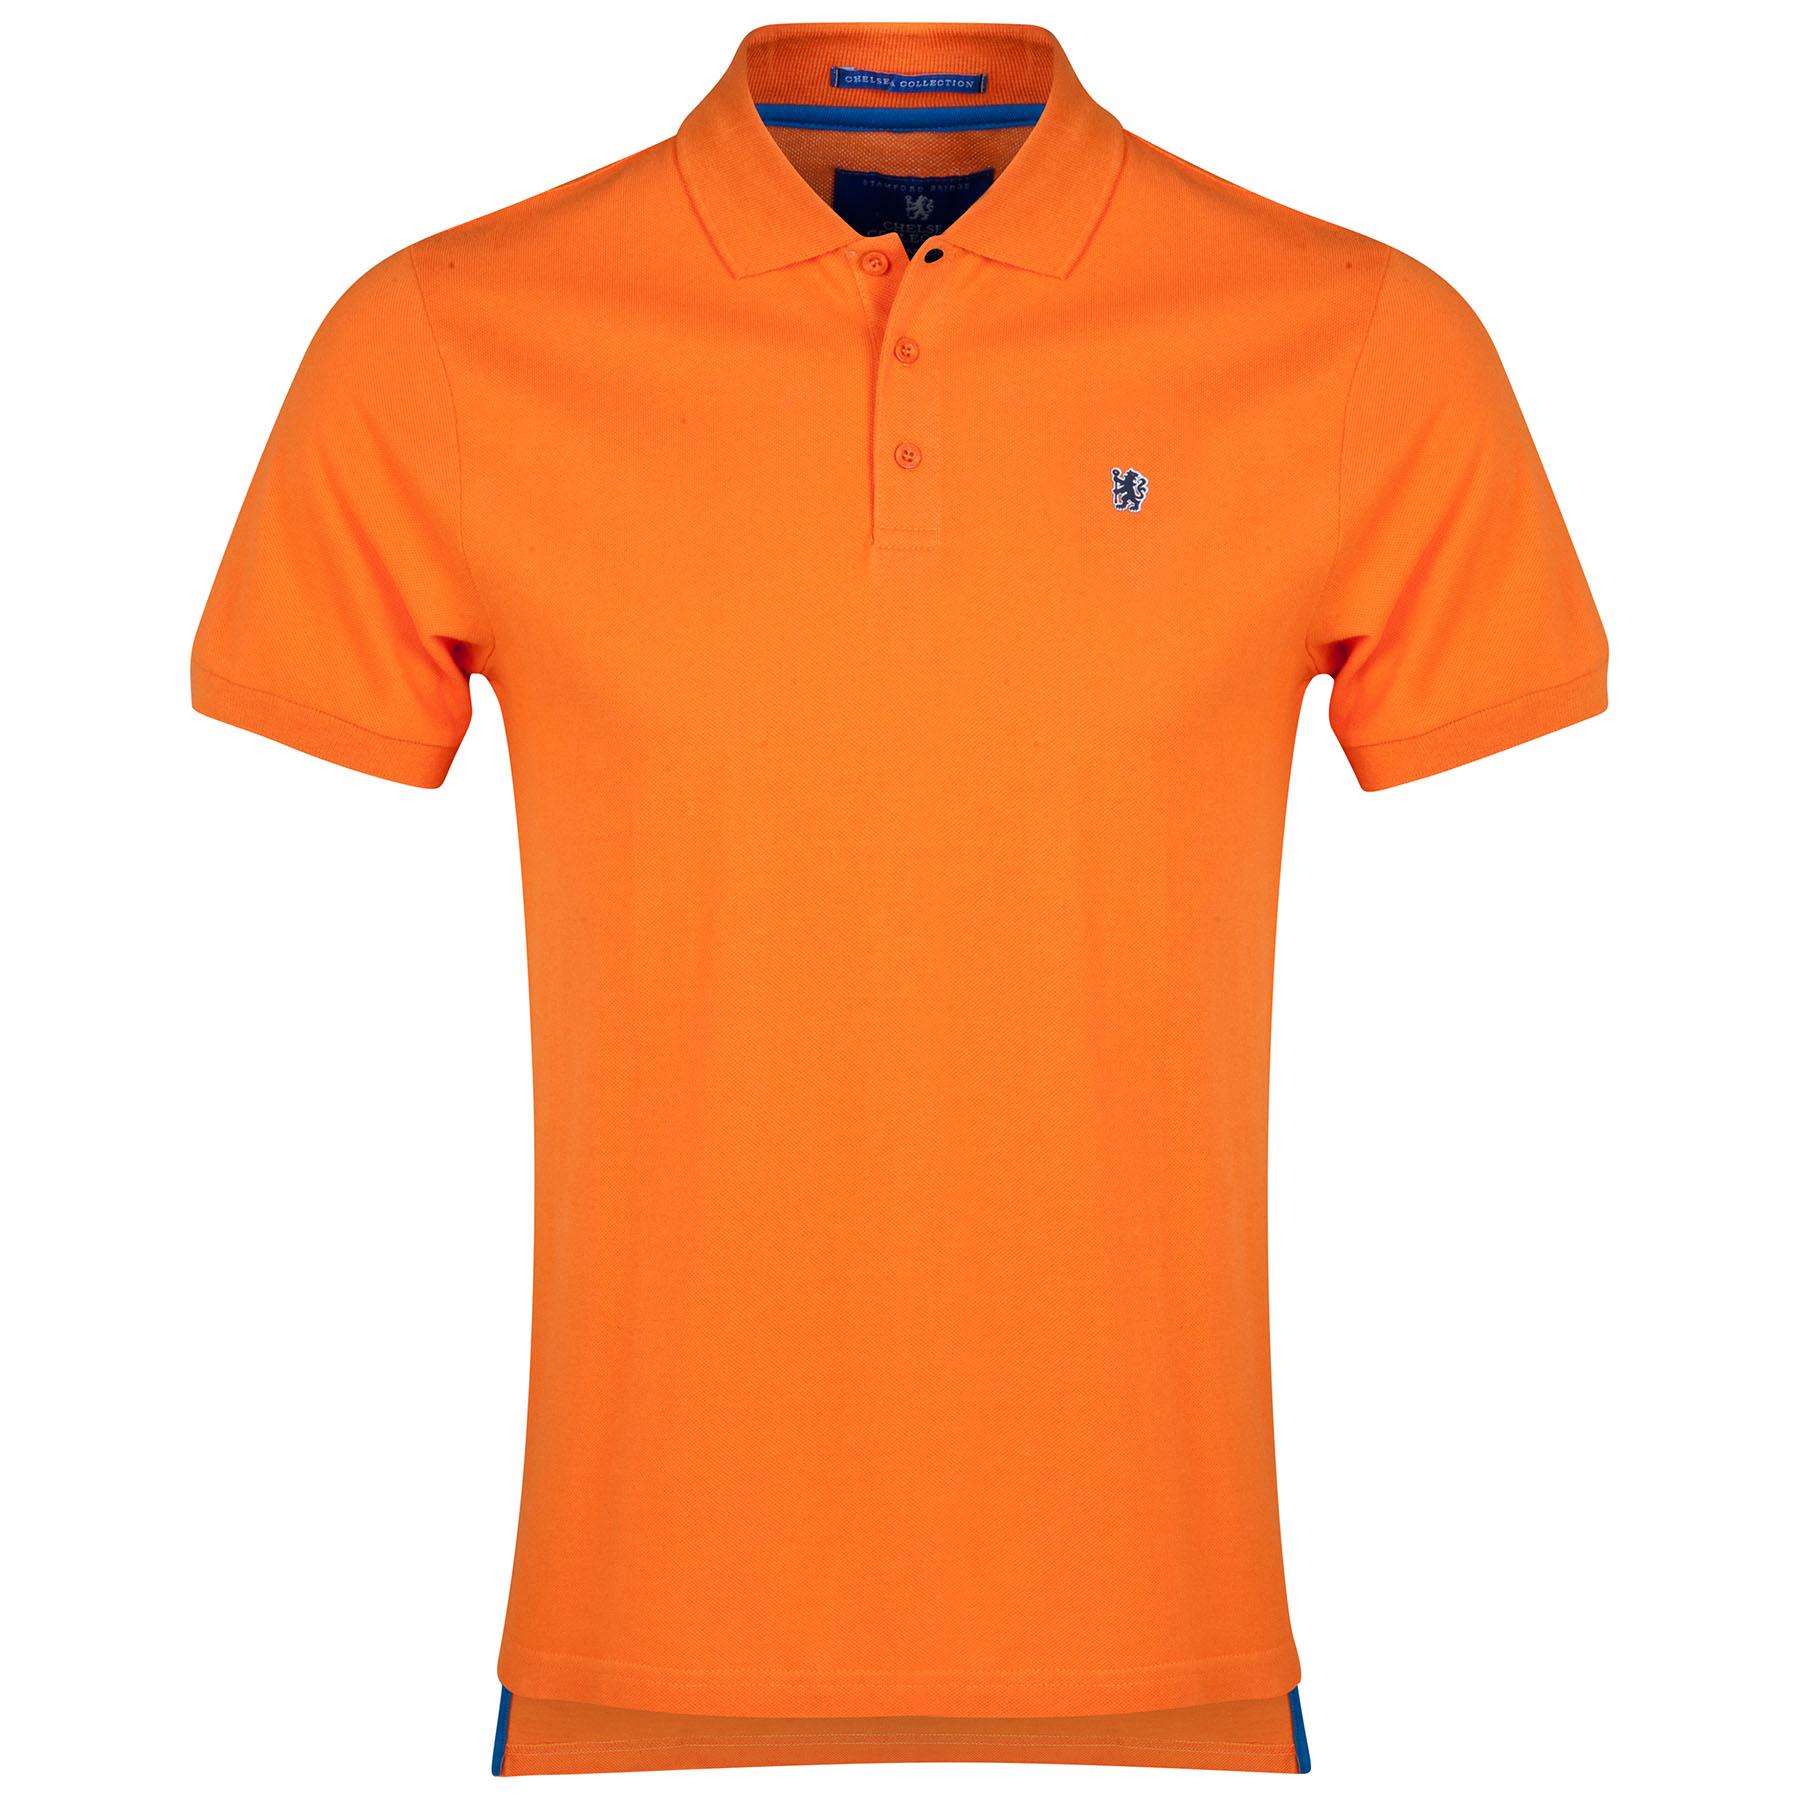 Chelsea Lion Polo Shirt - Orange - Mens